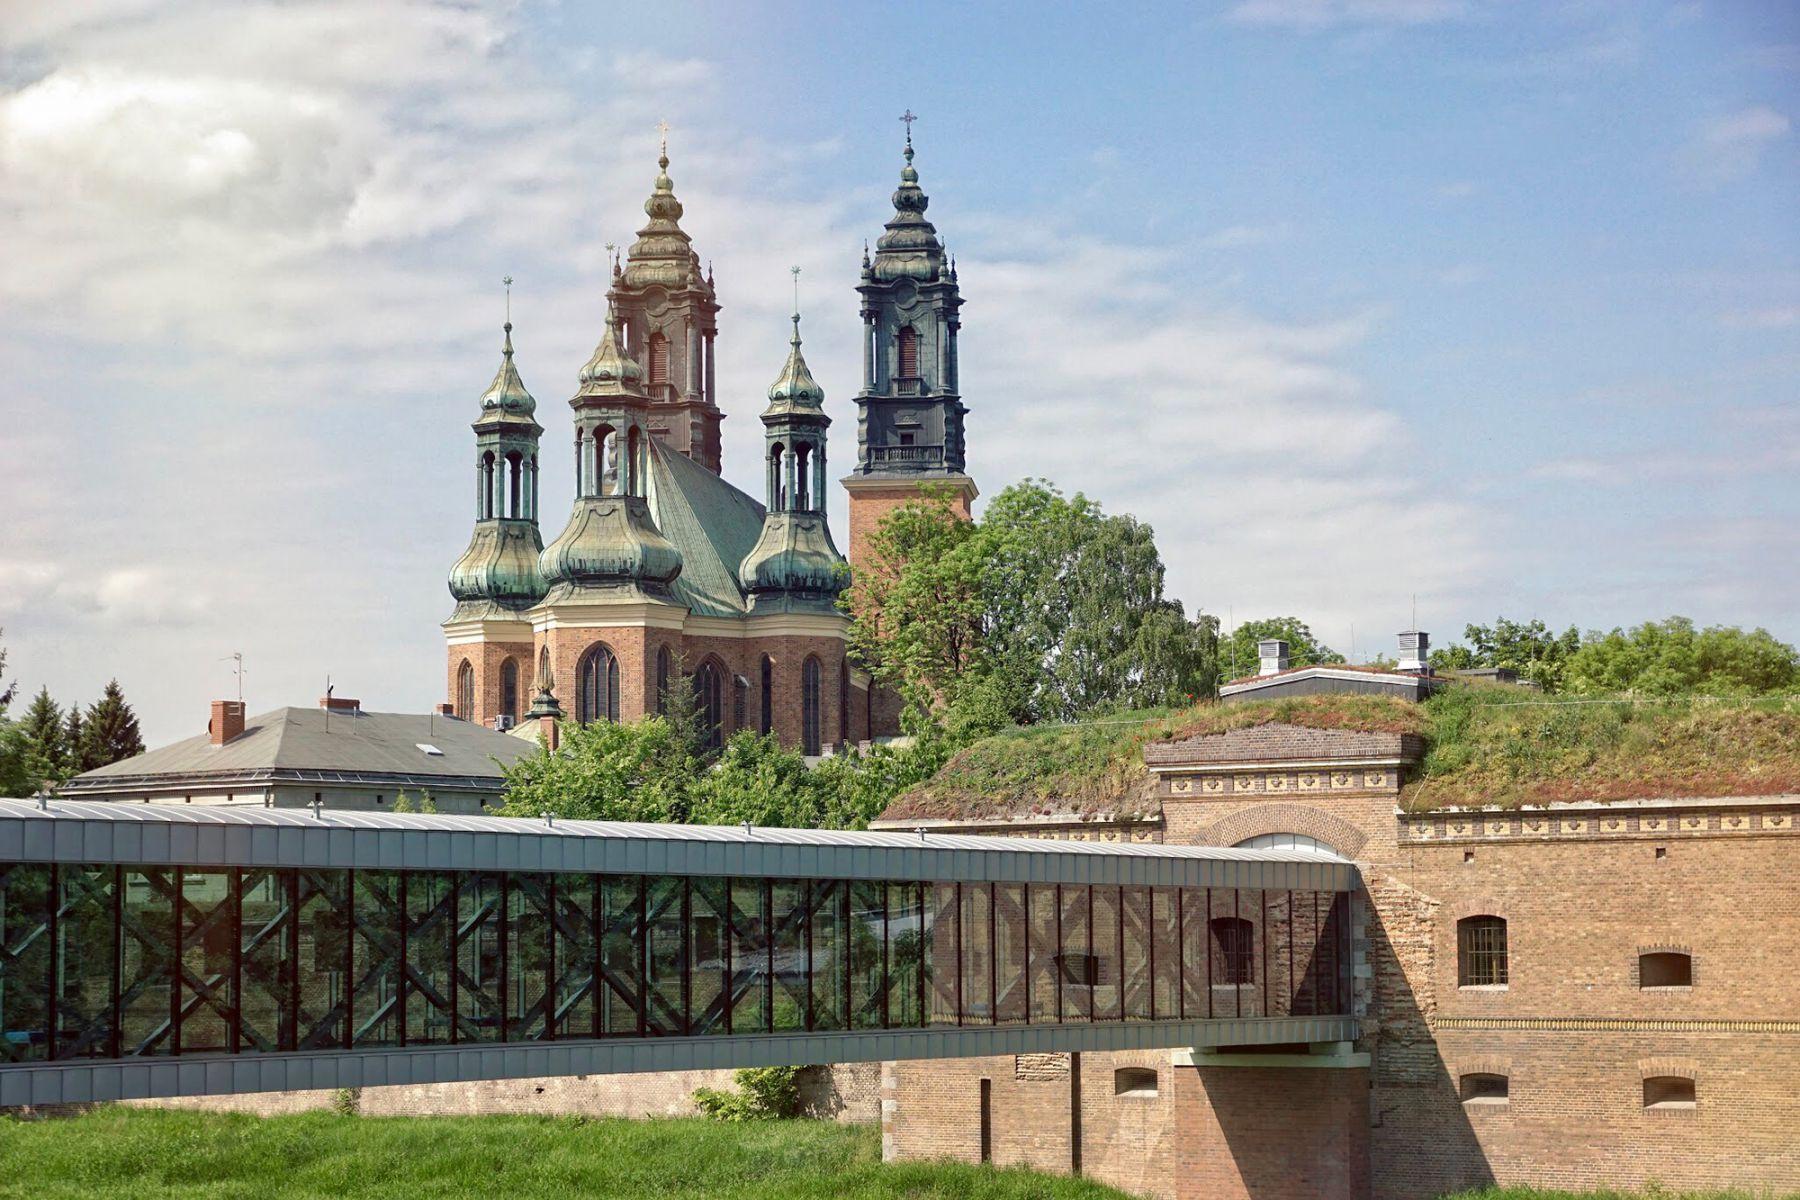 Het kathedraaleiland met de basiliek | credit: Piotr Andrzejewski